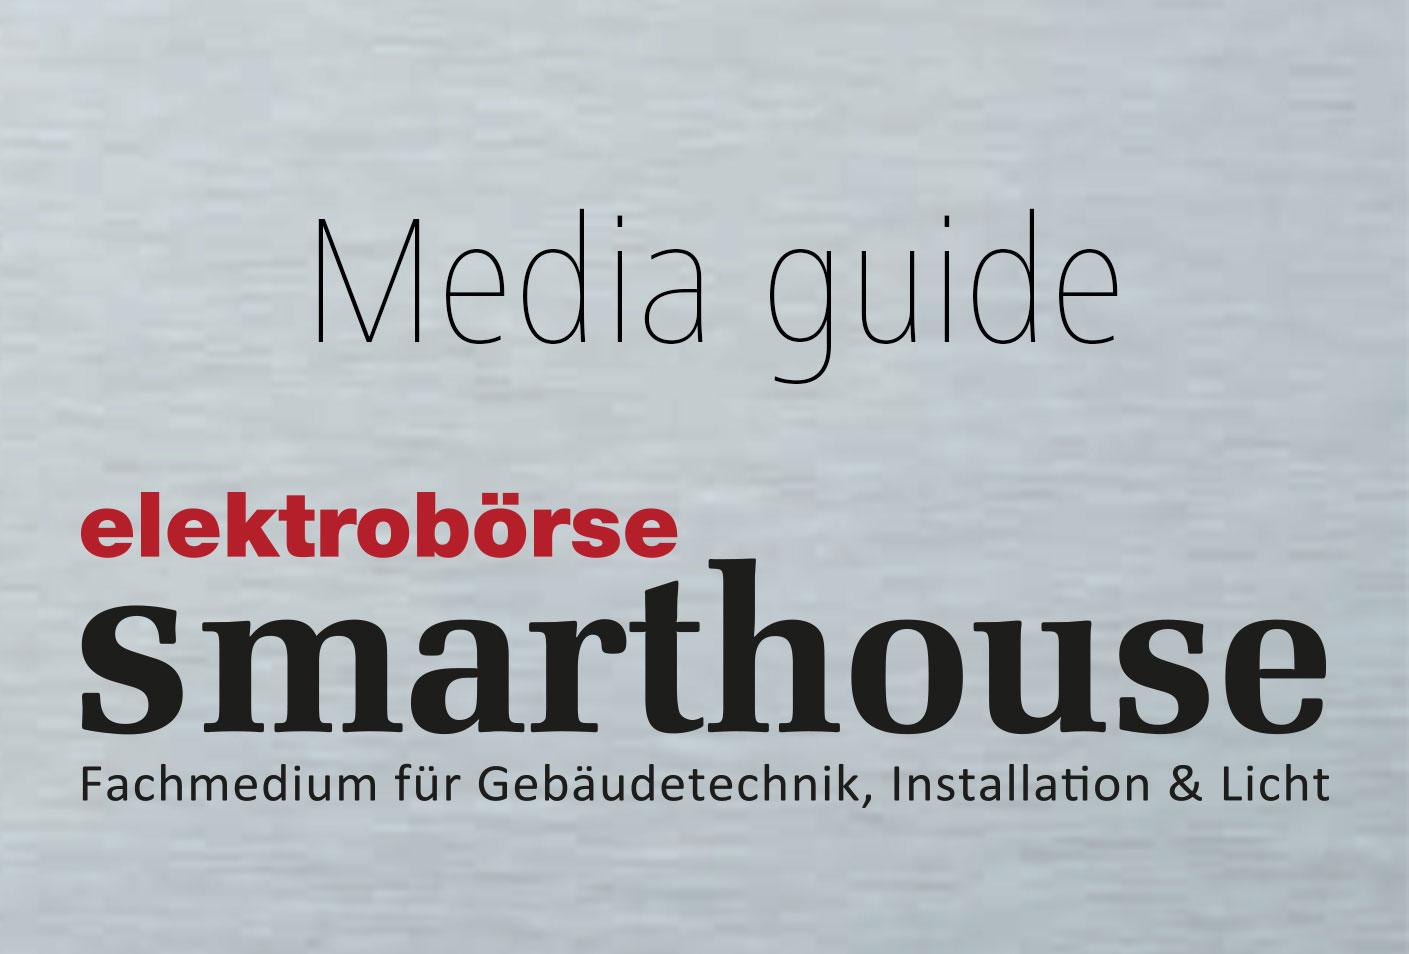 elektroboerse-smarthouse